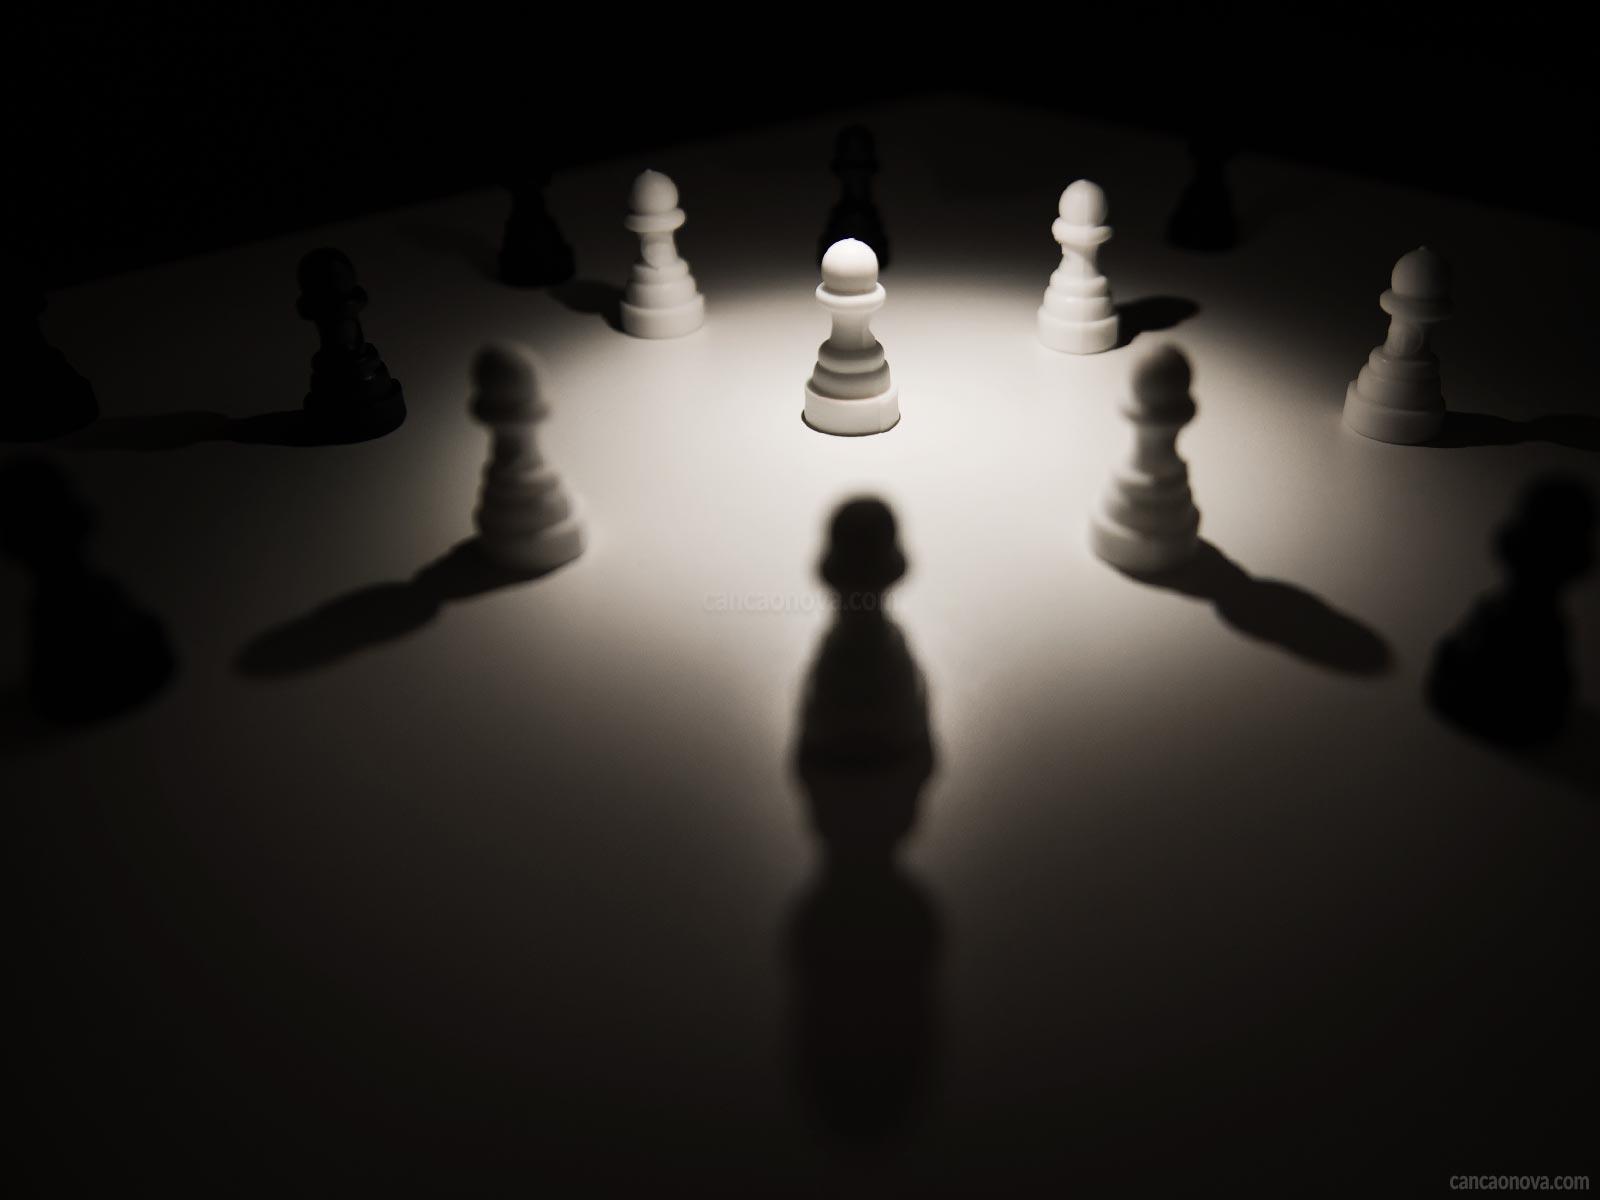 veja-oito-aspectos-do-individualismo-do-ser-humano